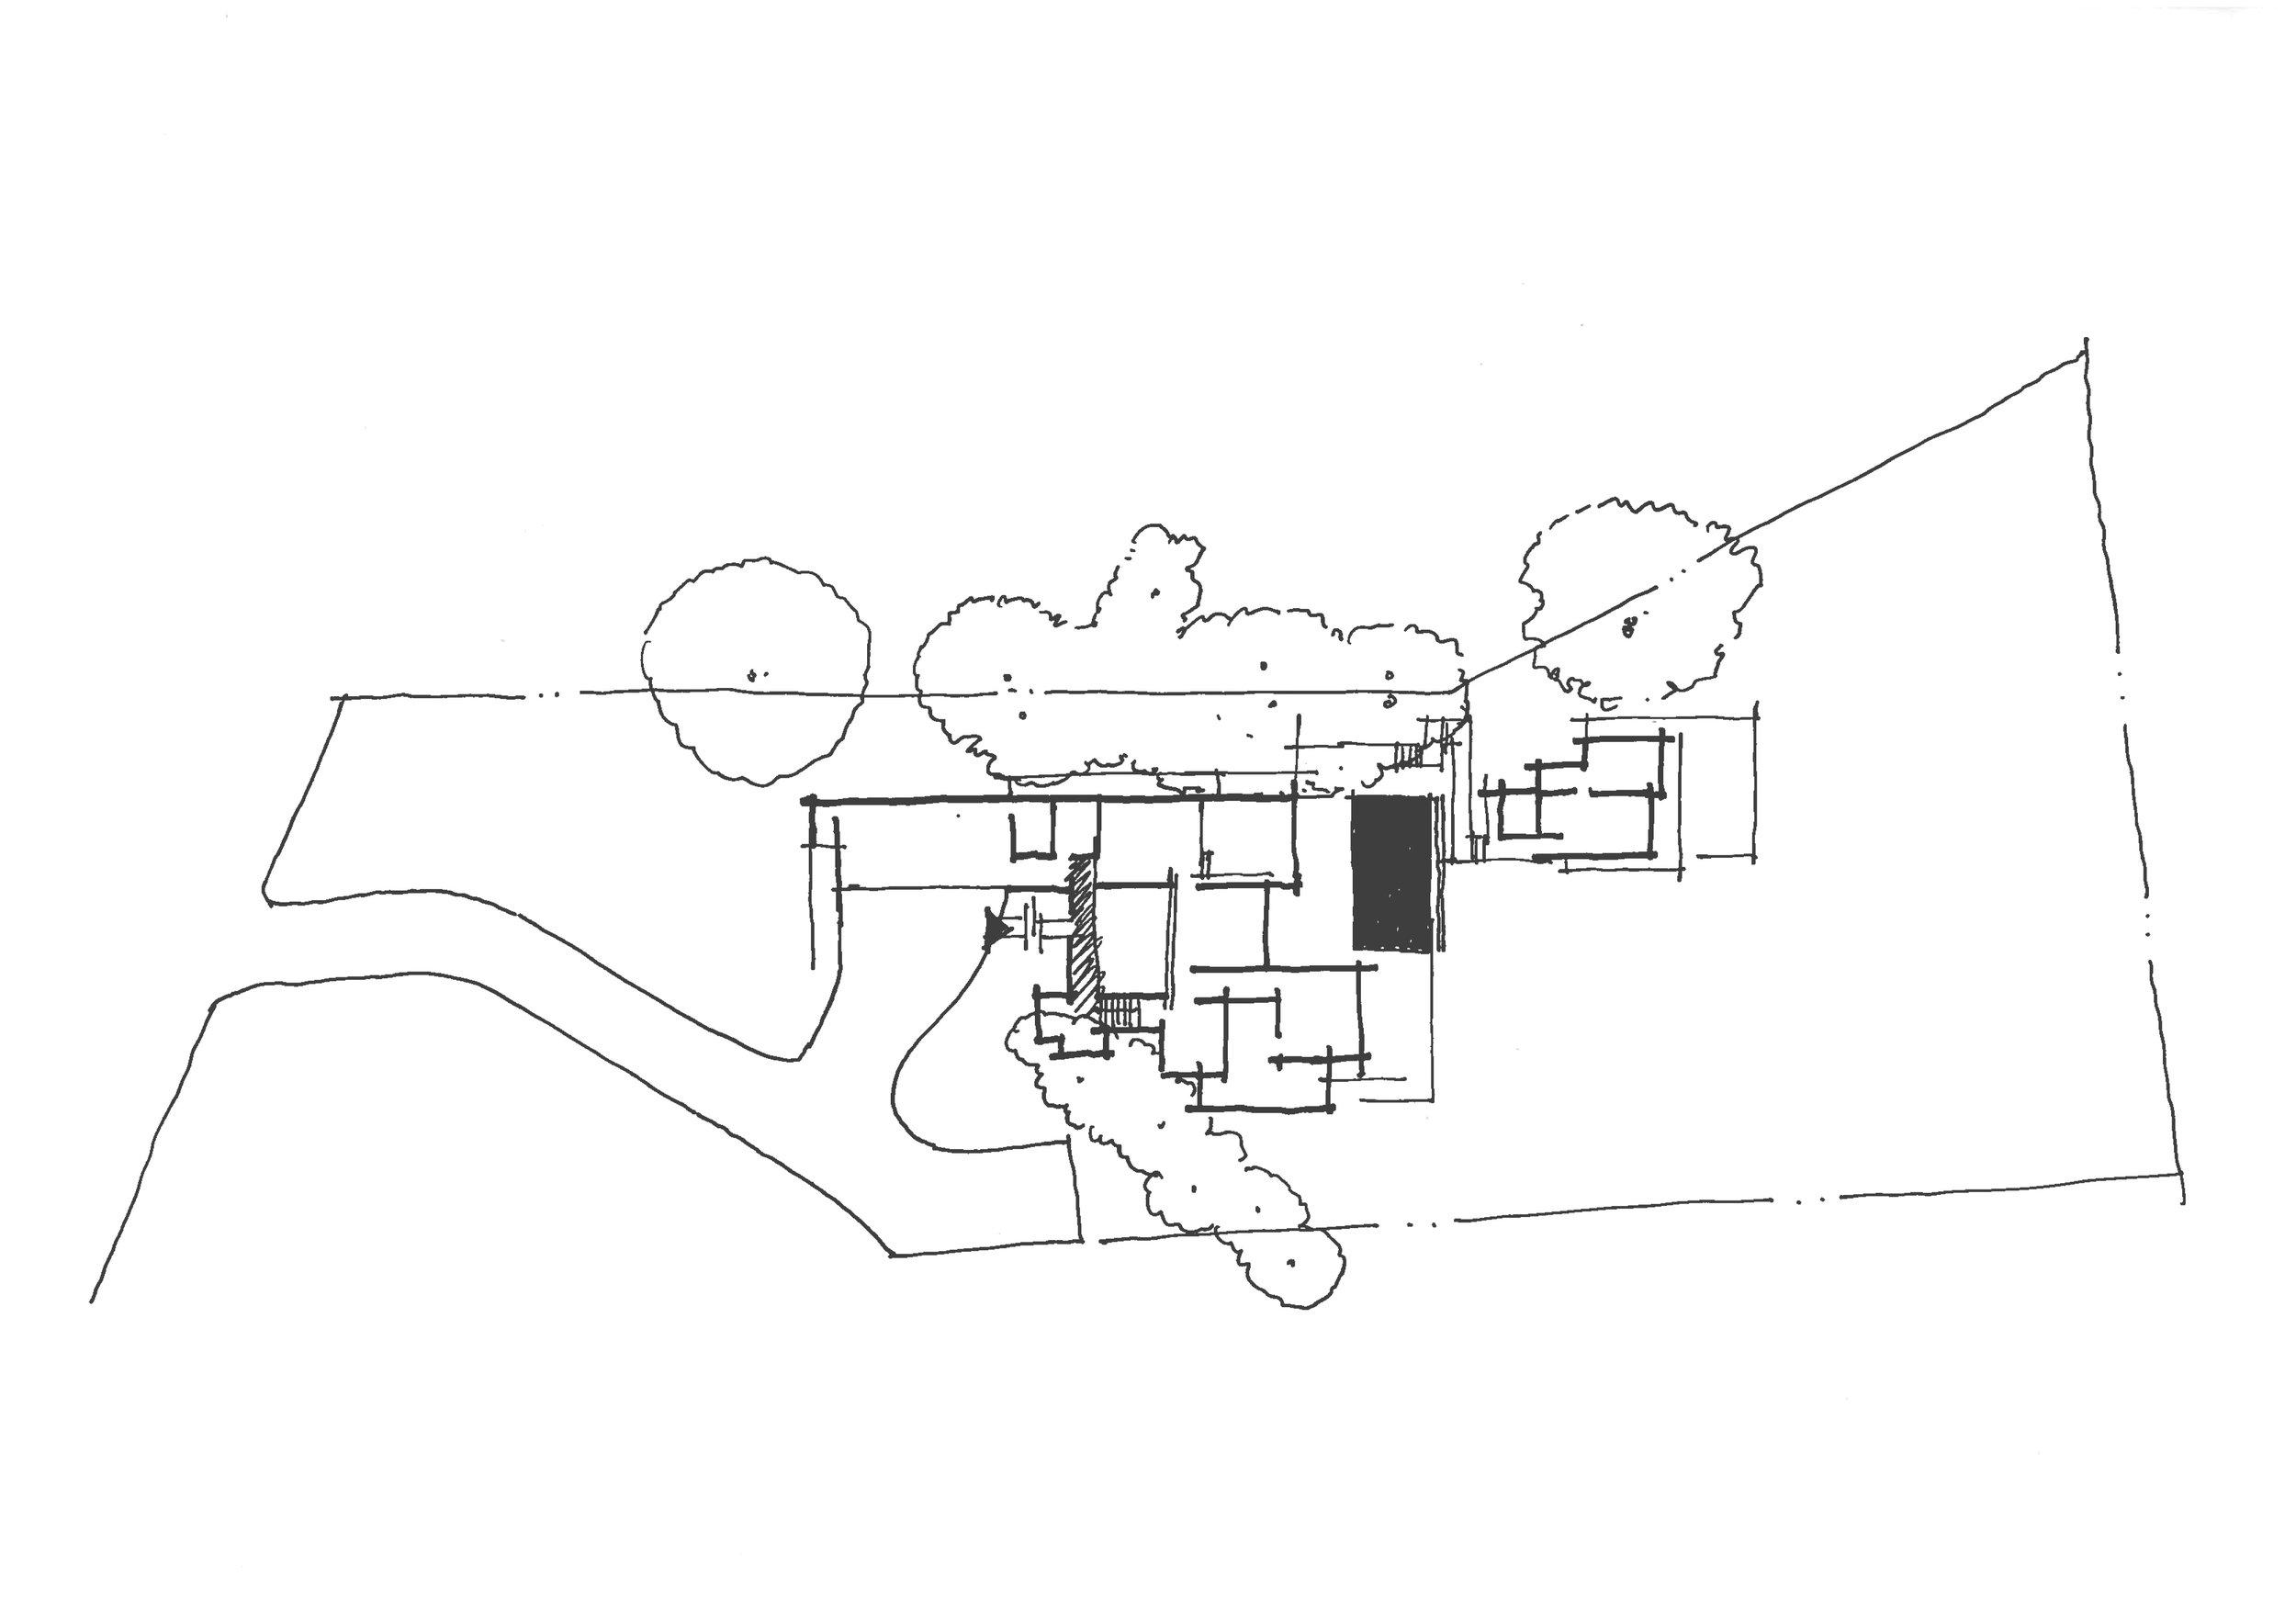 SMA_Mora Estates_Site Plan Sketch_Bob_20160923.jpg